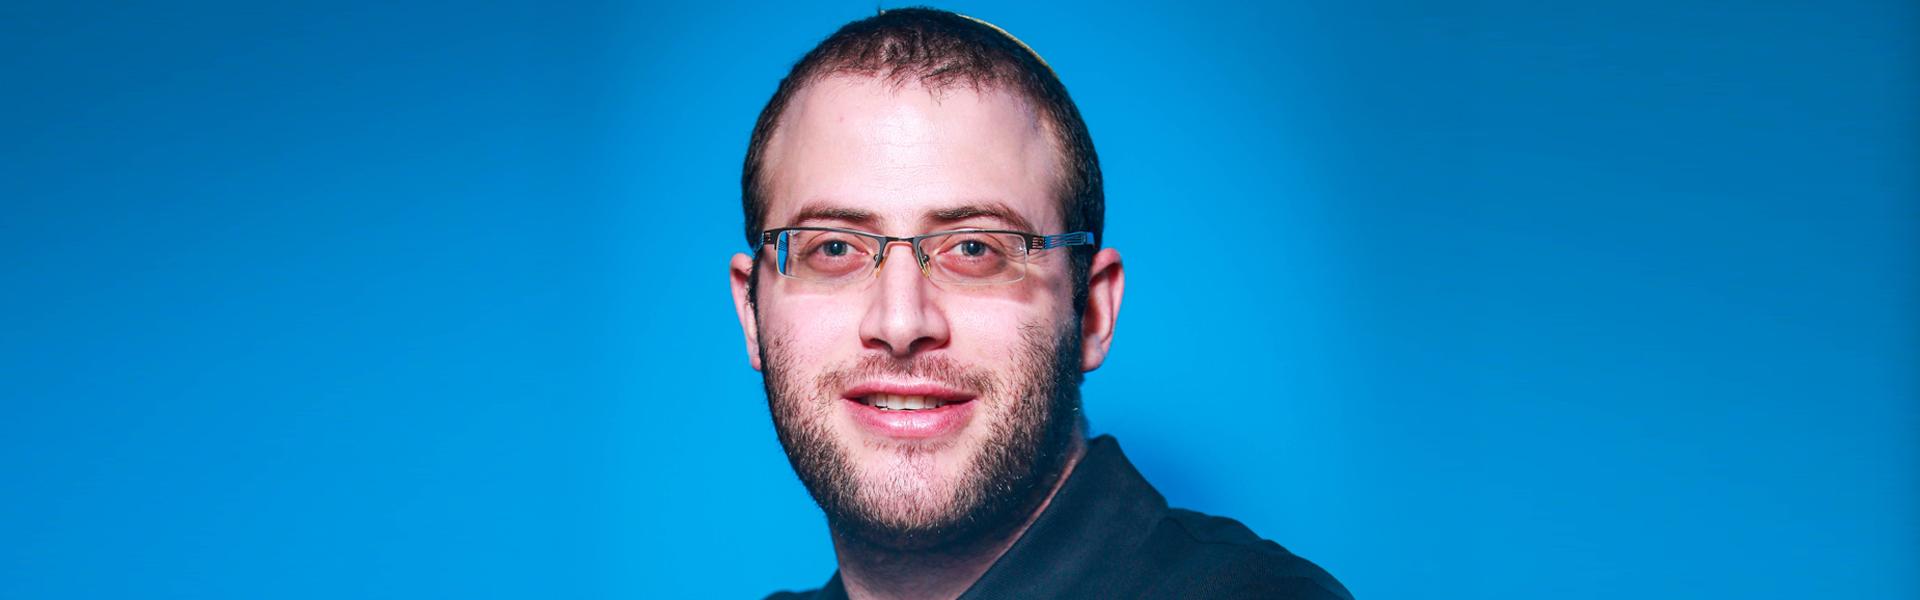 10 Most Promising Start-Ups - מייסד Claroty / צילום: שלומי יוסף